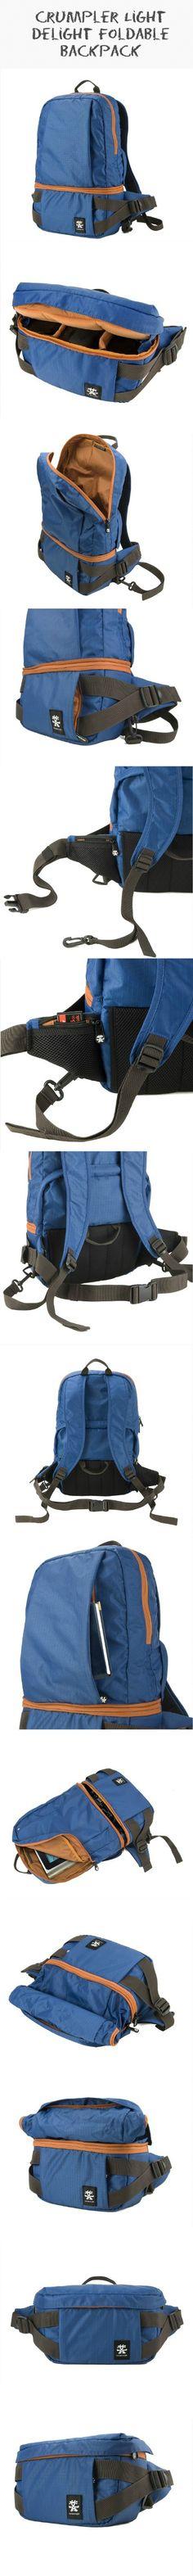 Online Shop - Crumpler - Gear for Urban Living Camera Backpack, Camera Bags, Photo Bag, Canon Dslr, Designer Backpacks, Travel Bags, Infographics, Gears, Calm